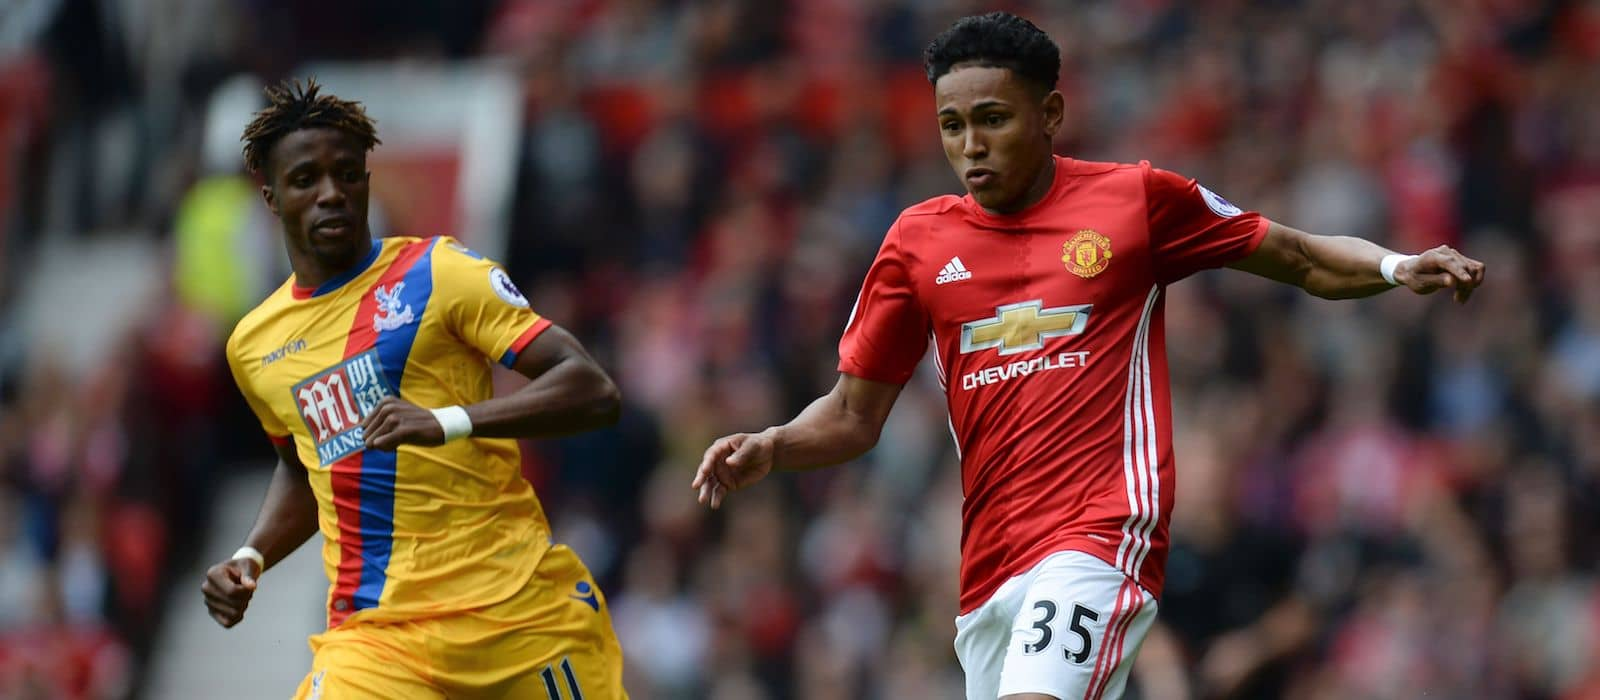 Hot prospect Largie Ramazani among nine players released by Manchester United